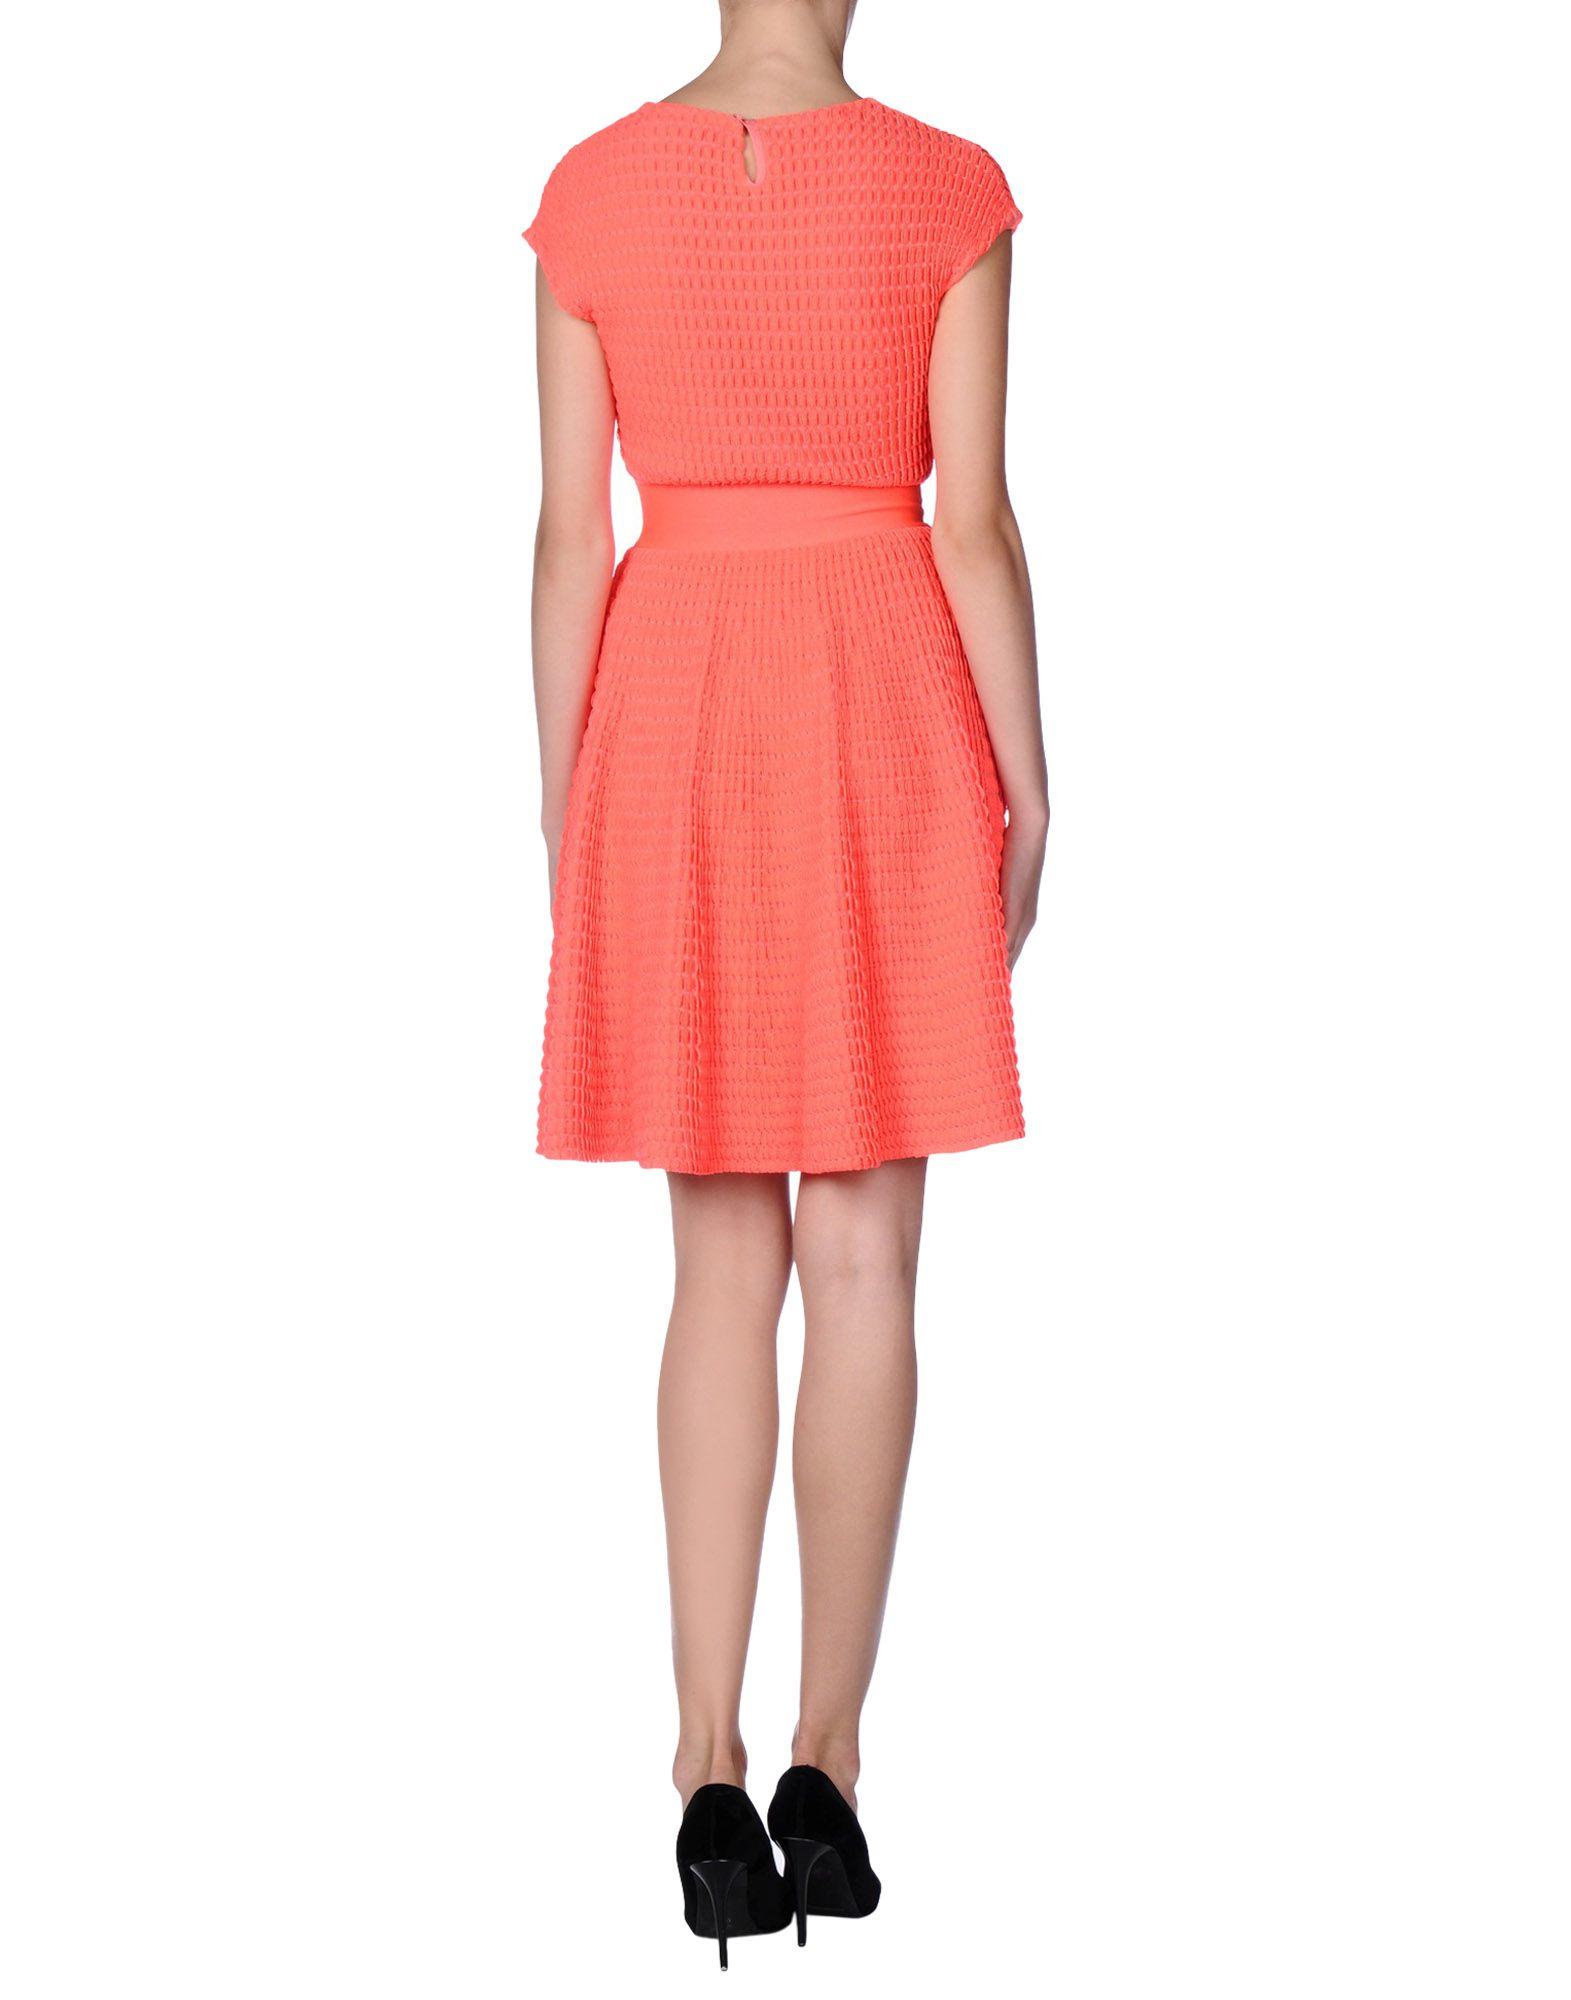 dior short dresses - photo #9